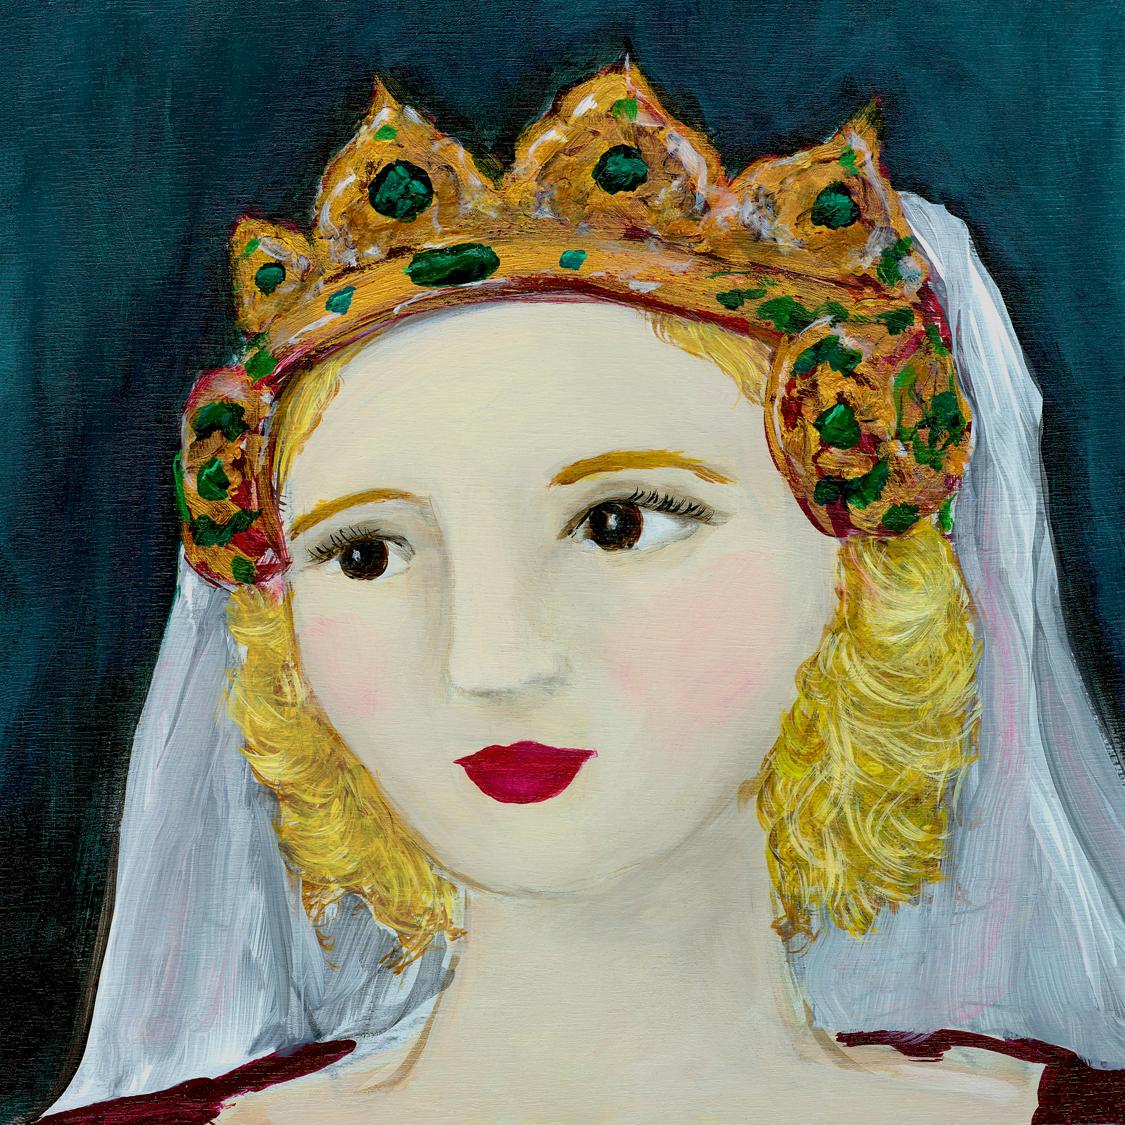 Allyn_Howard_Queen-England-Isabella-of-France.jpg